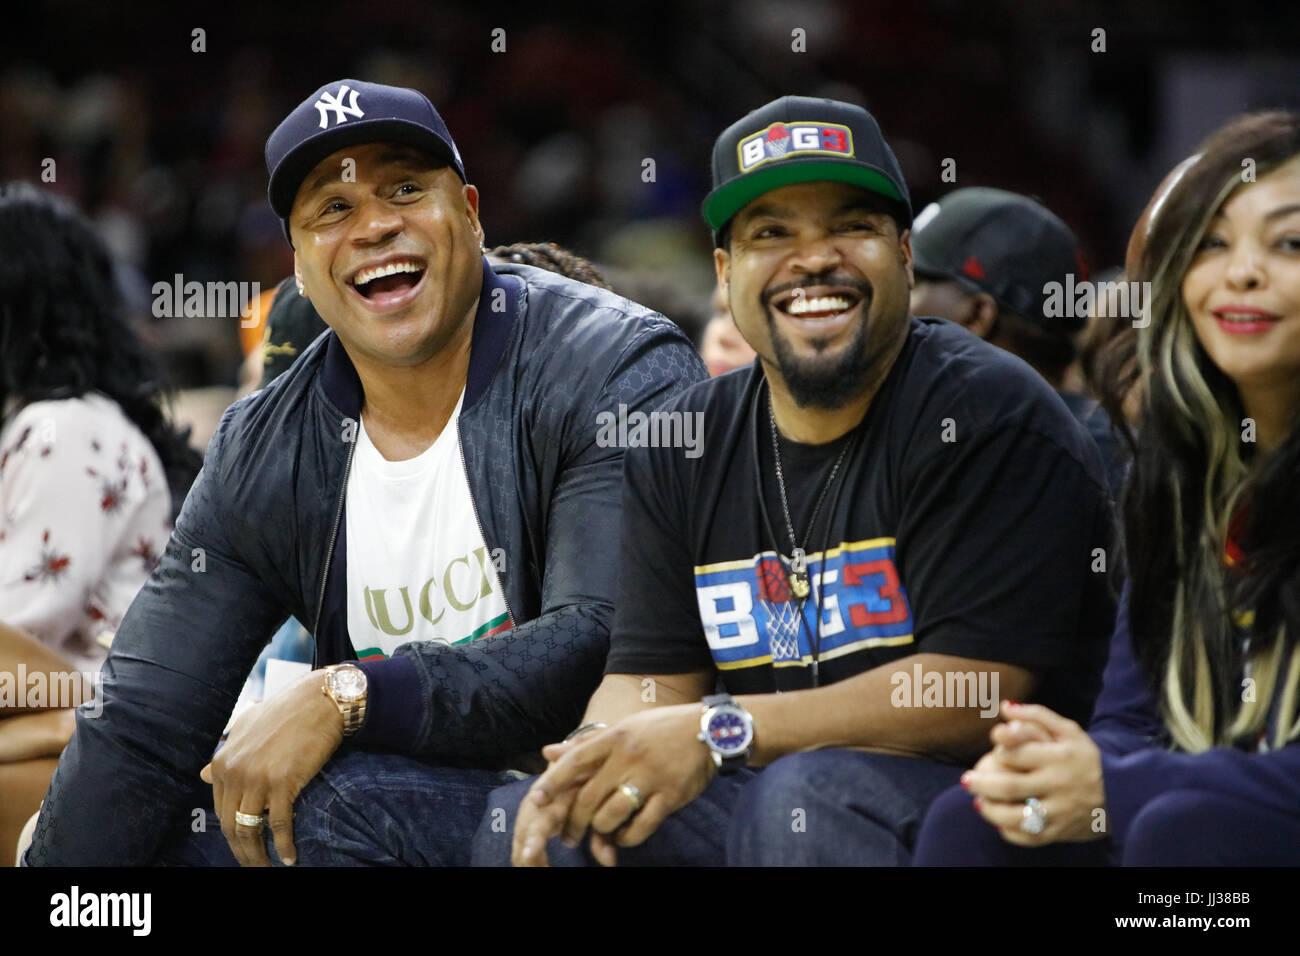 Ll cool j Ice Cube besuchen Big 3 Liga phiily, Pa 7/16/17. Stockbild